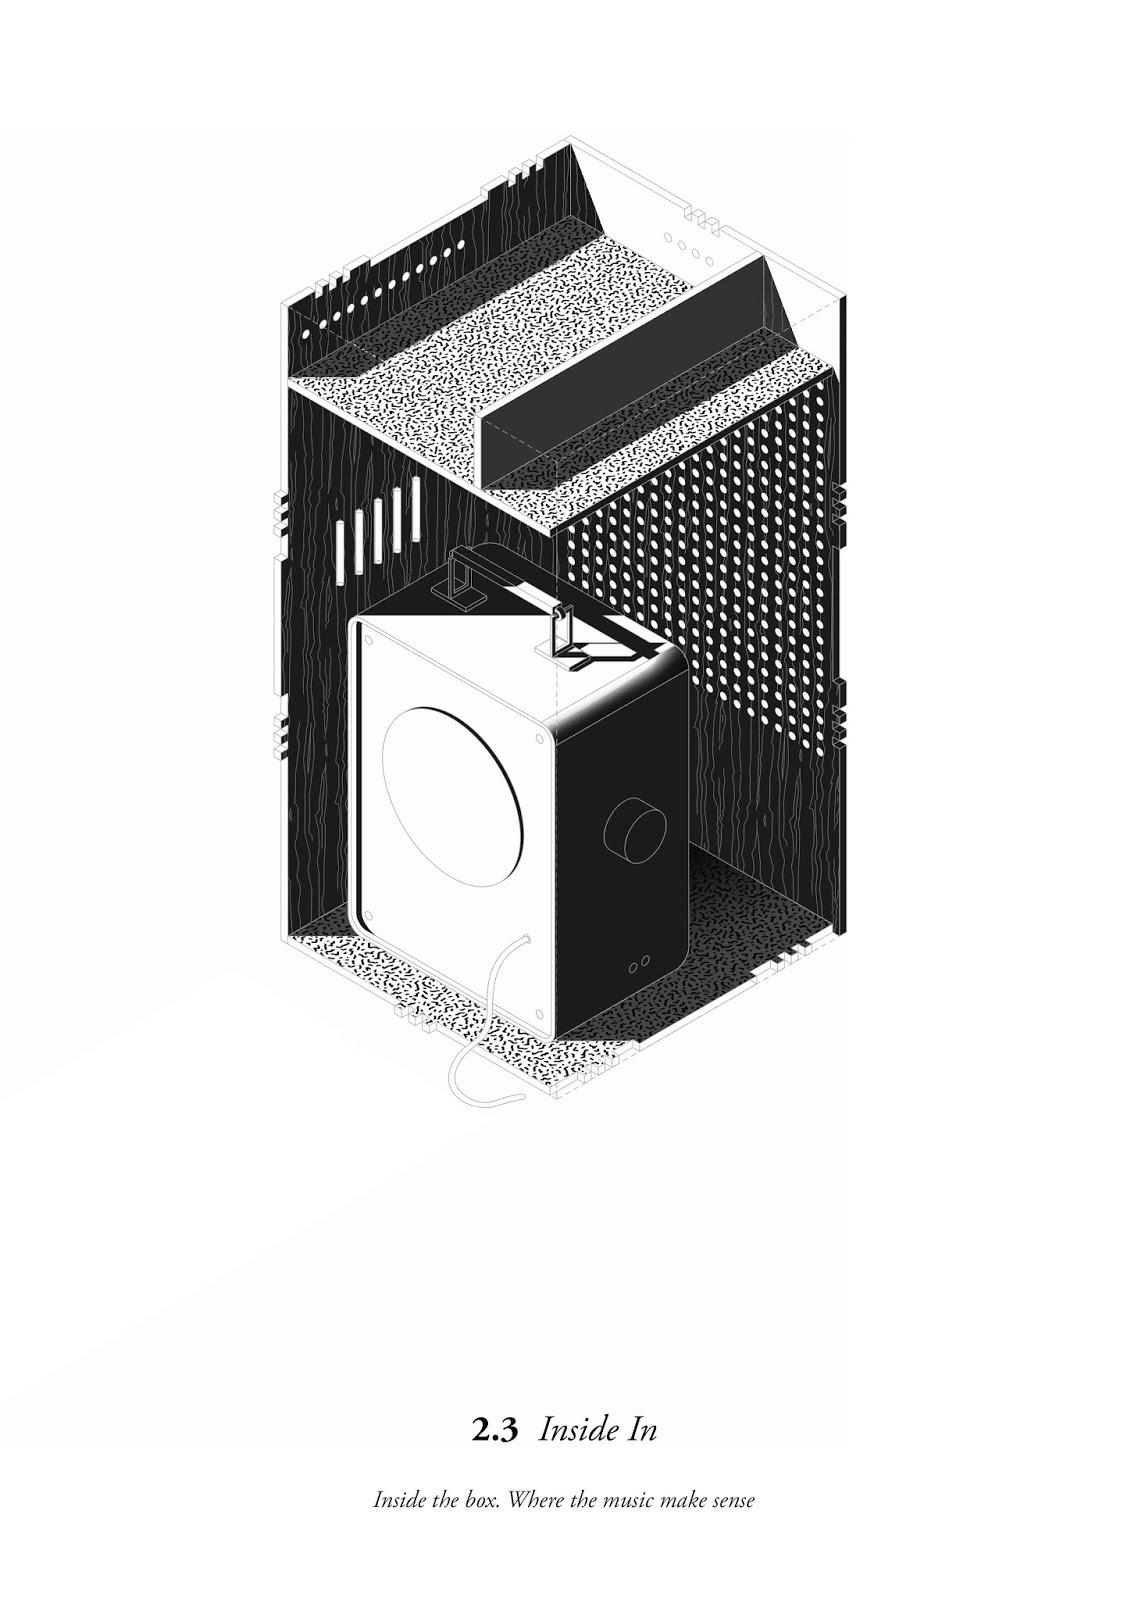 02_David-del-Valls_Architeutis-Duc